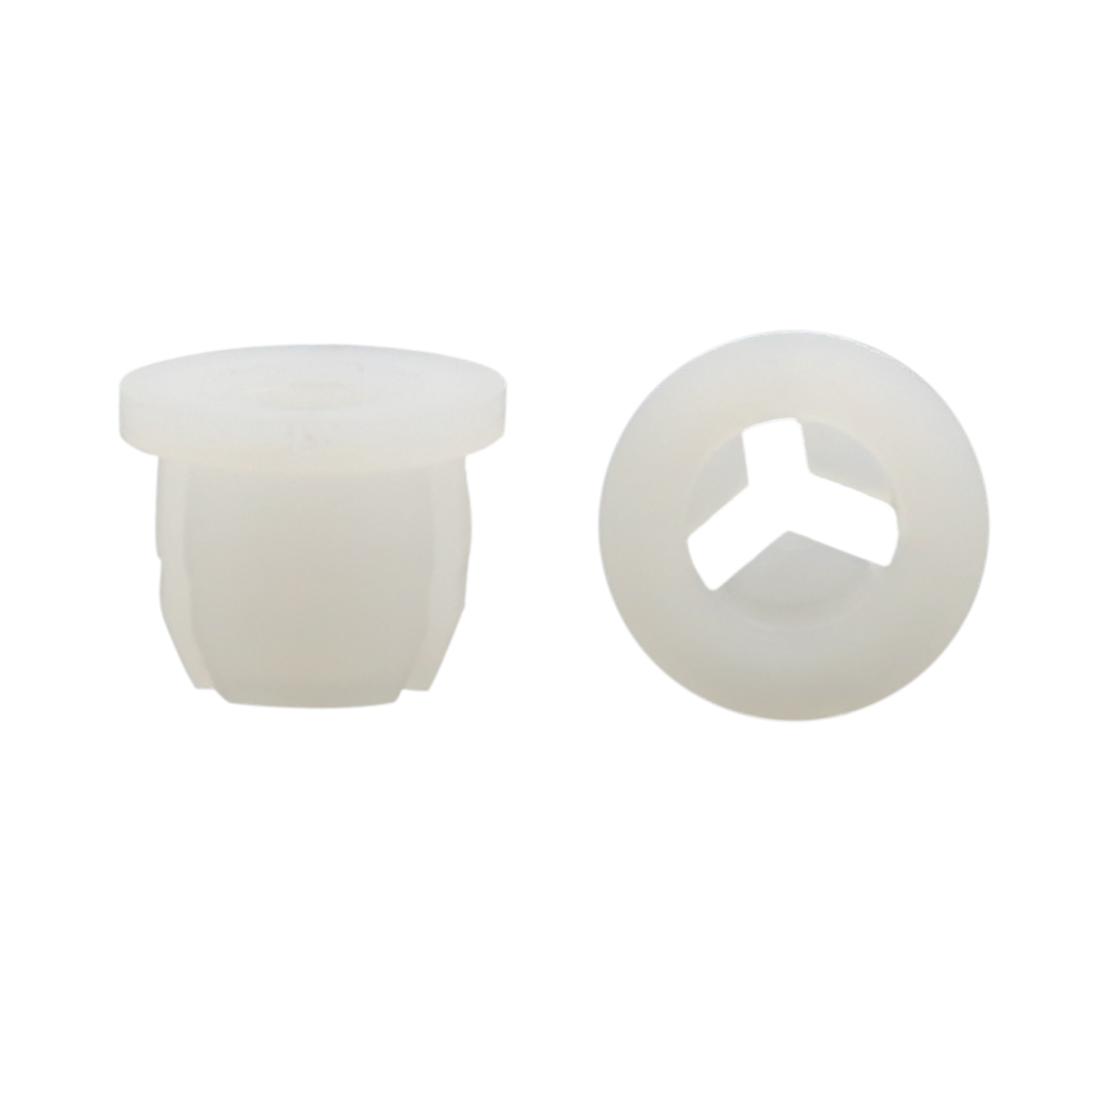 100Pcs White Plastic Rivets Fastener Fender Bumper Push Clips 10mm for Car